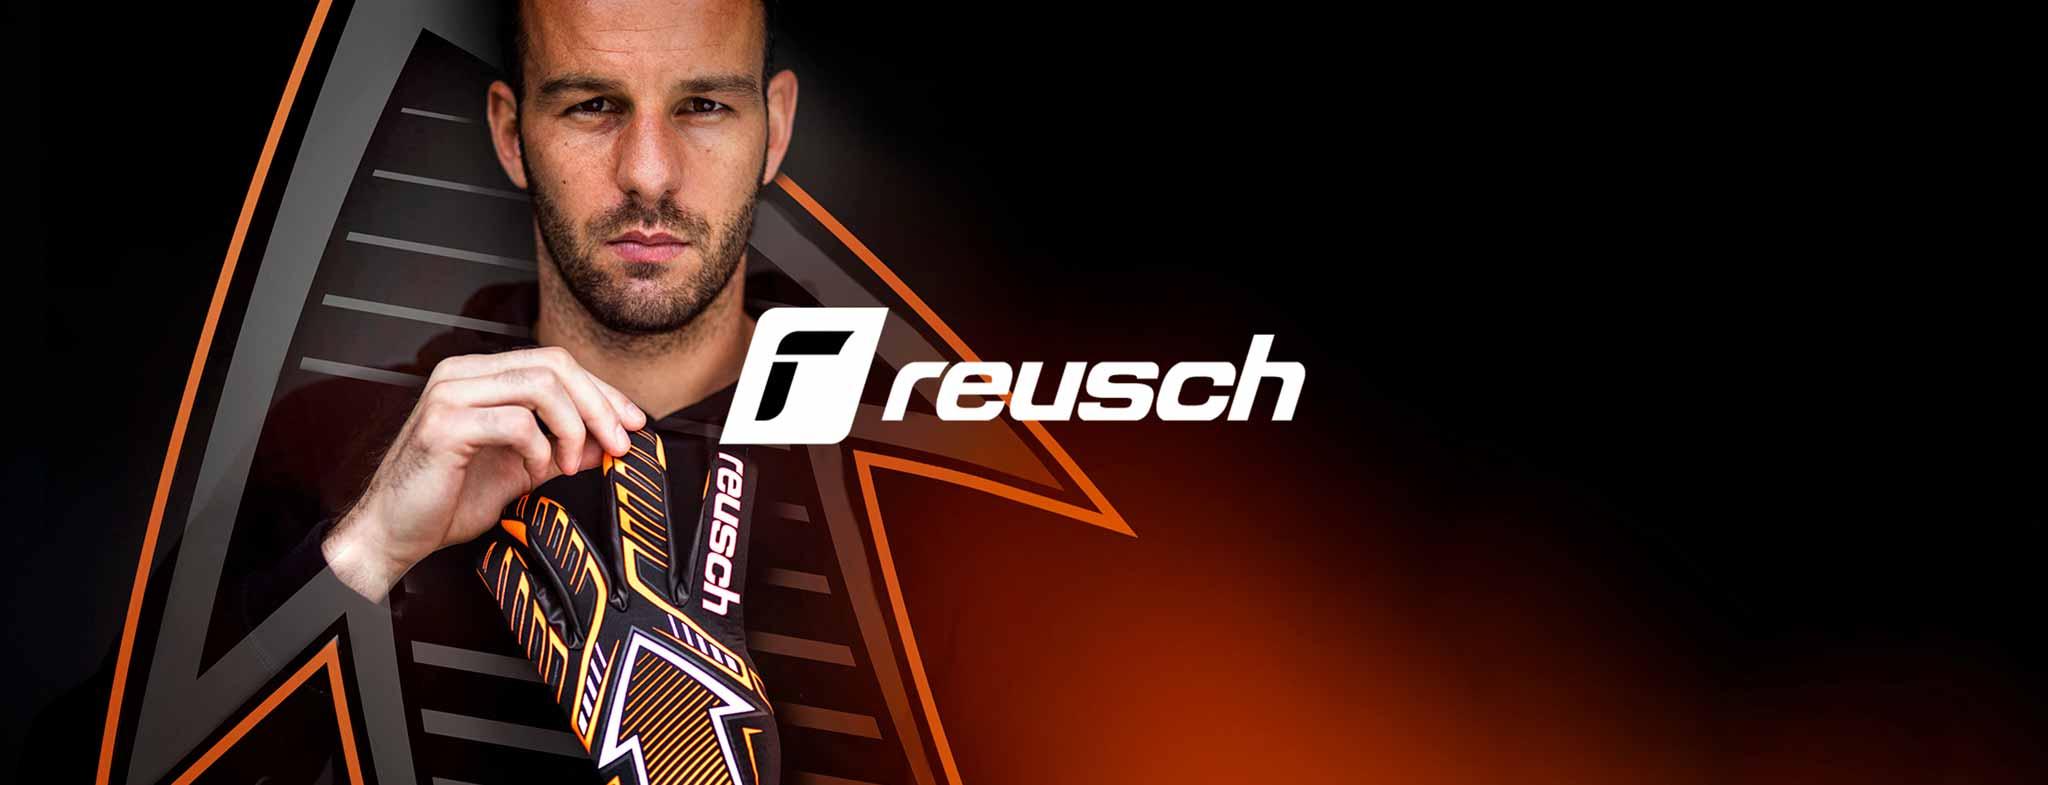 Cover-reusch-samir-handanovic-vratarske-rokavice-2